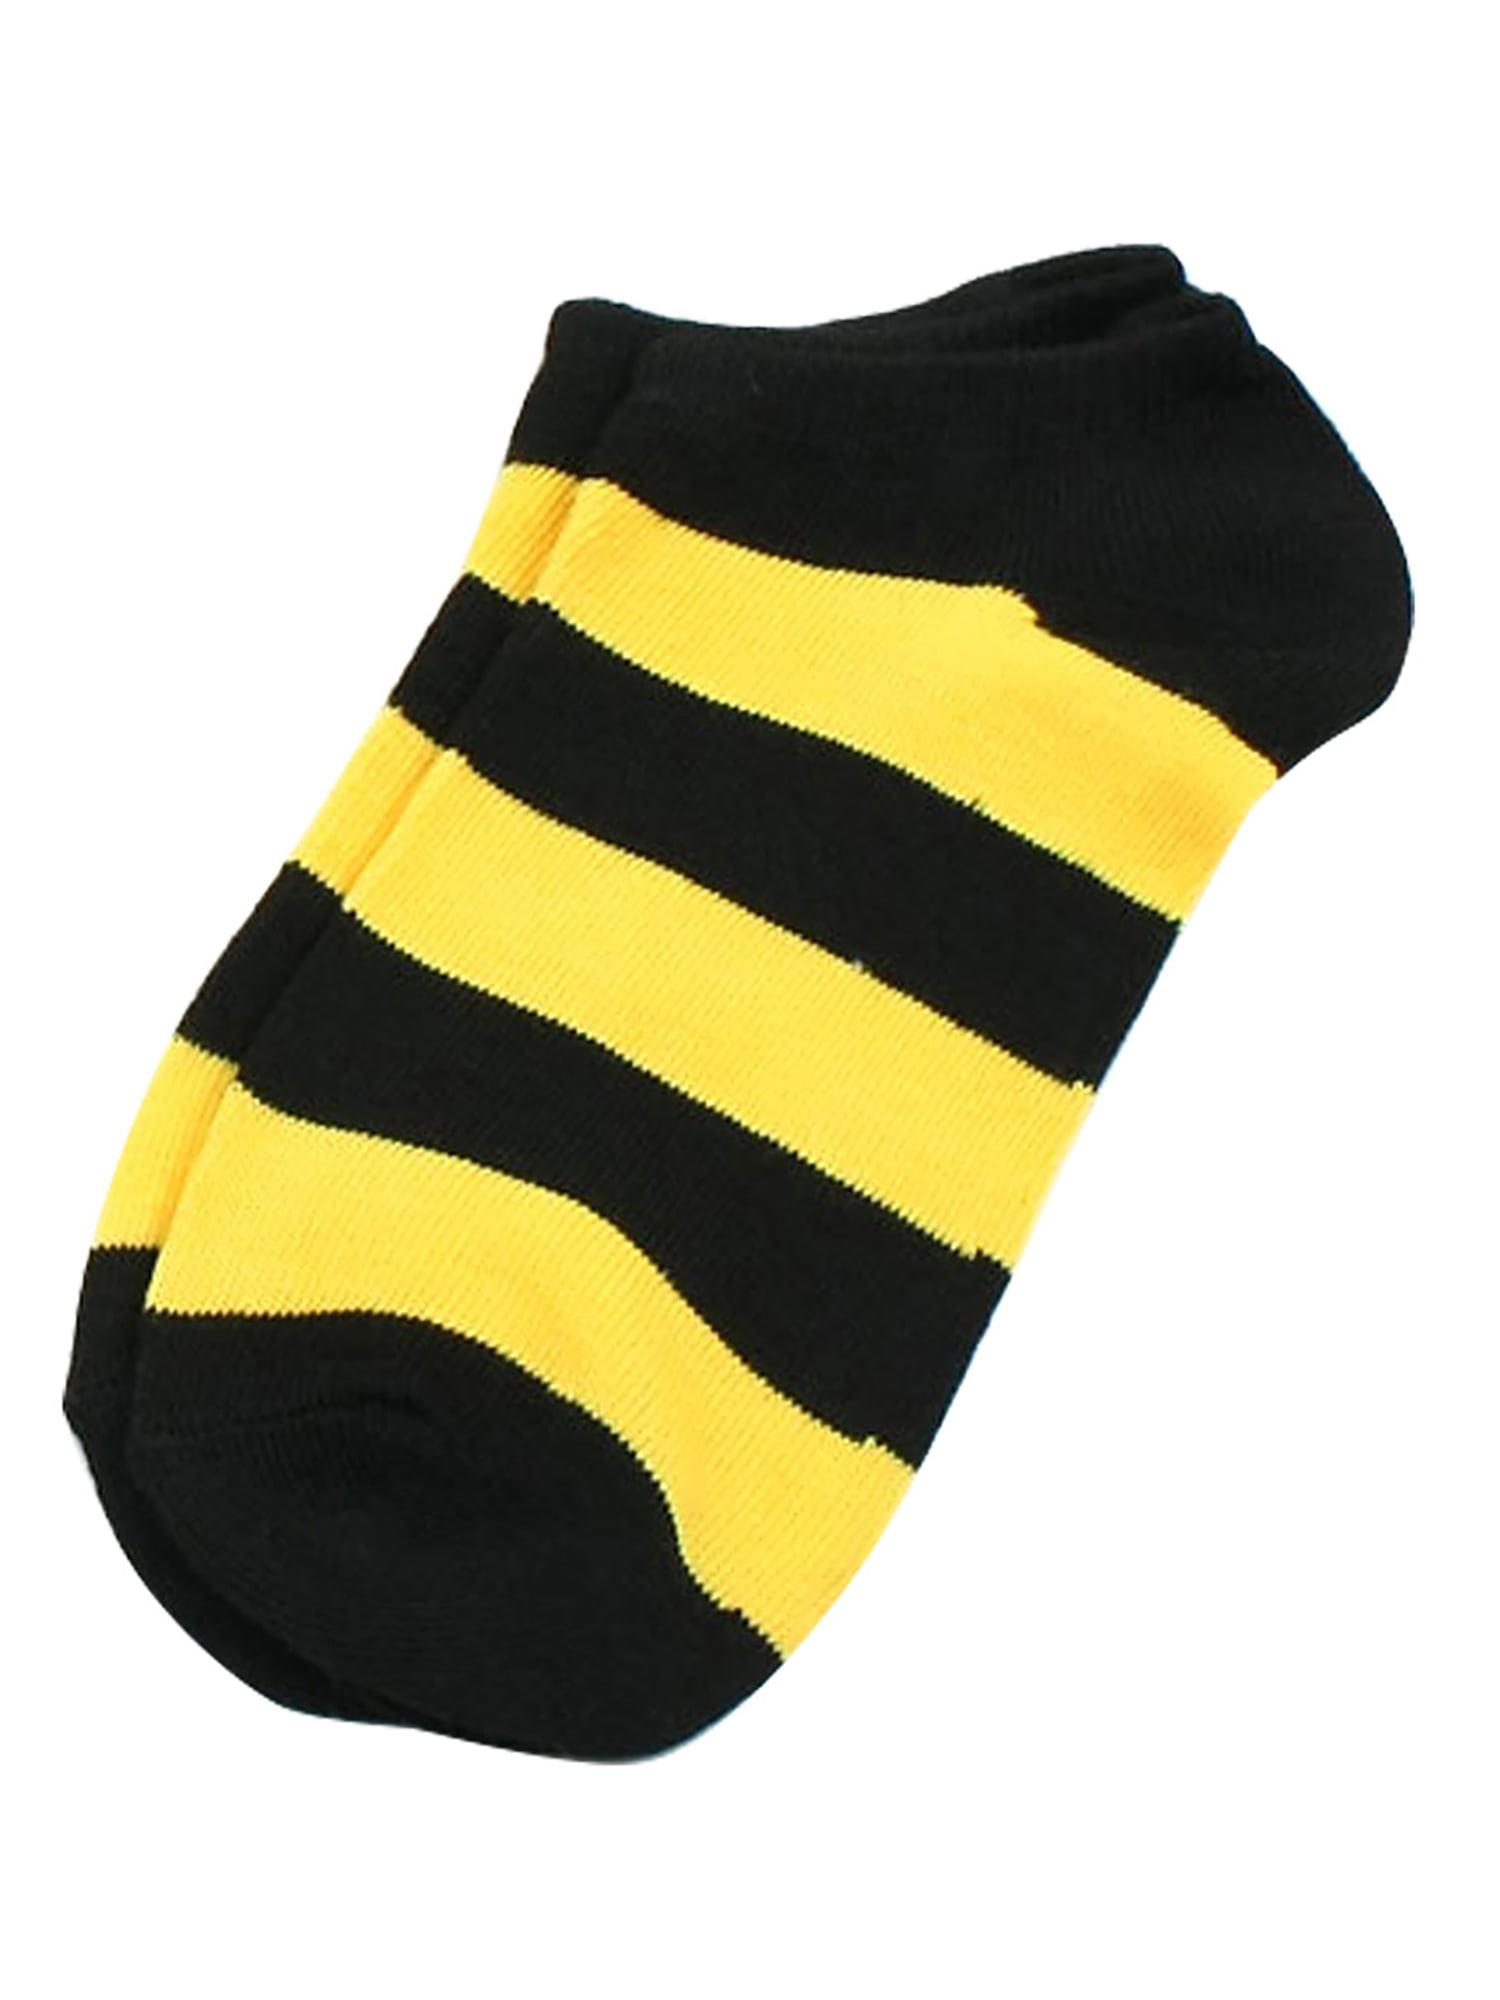 10 Pairs Girl Stripes Detail Elastic Footsie Style Low Cut Socks Yellow Black